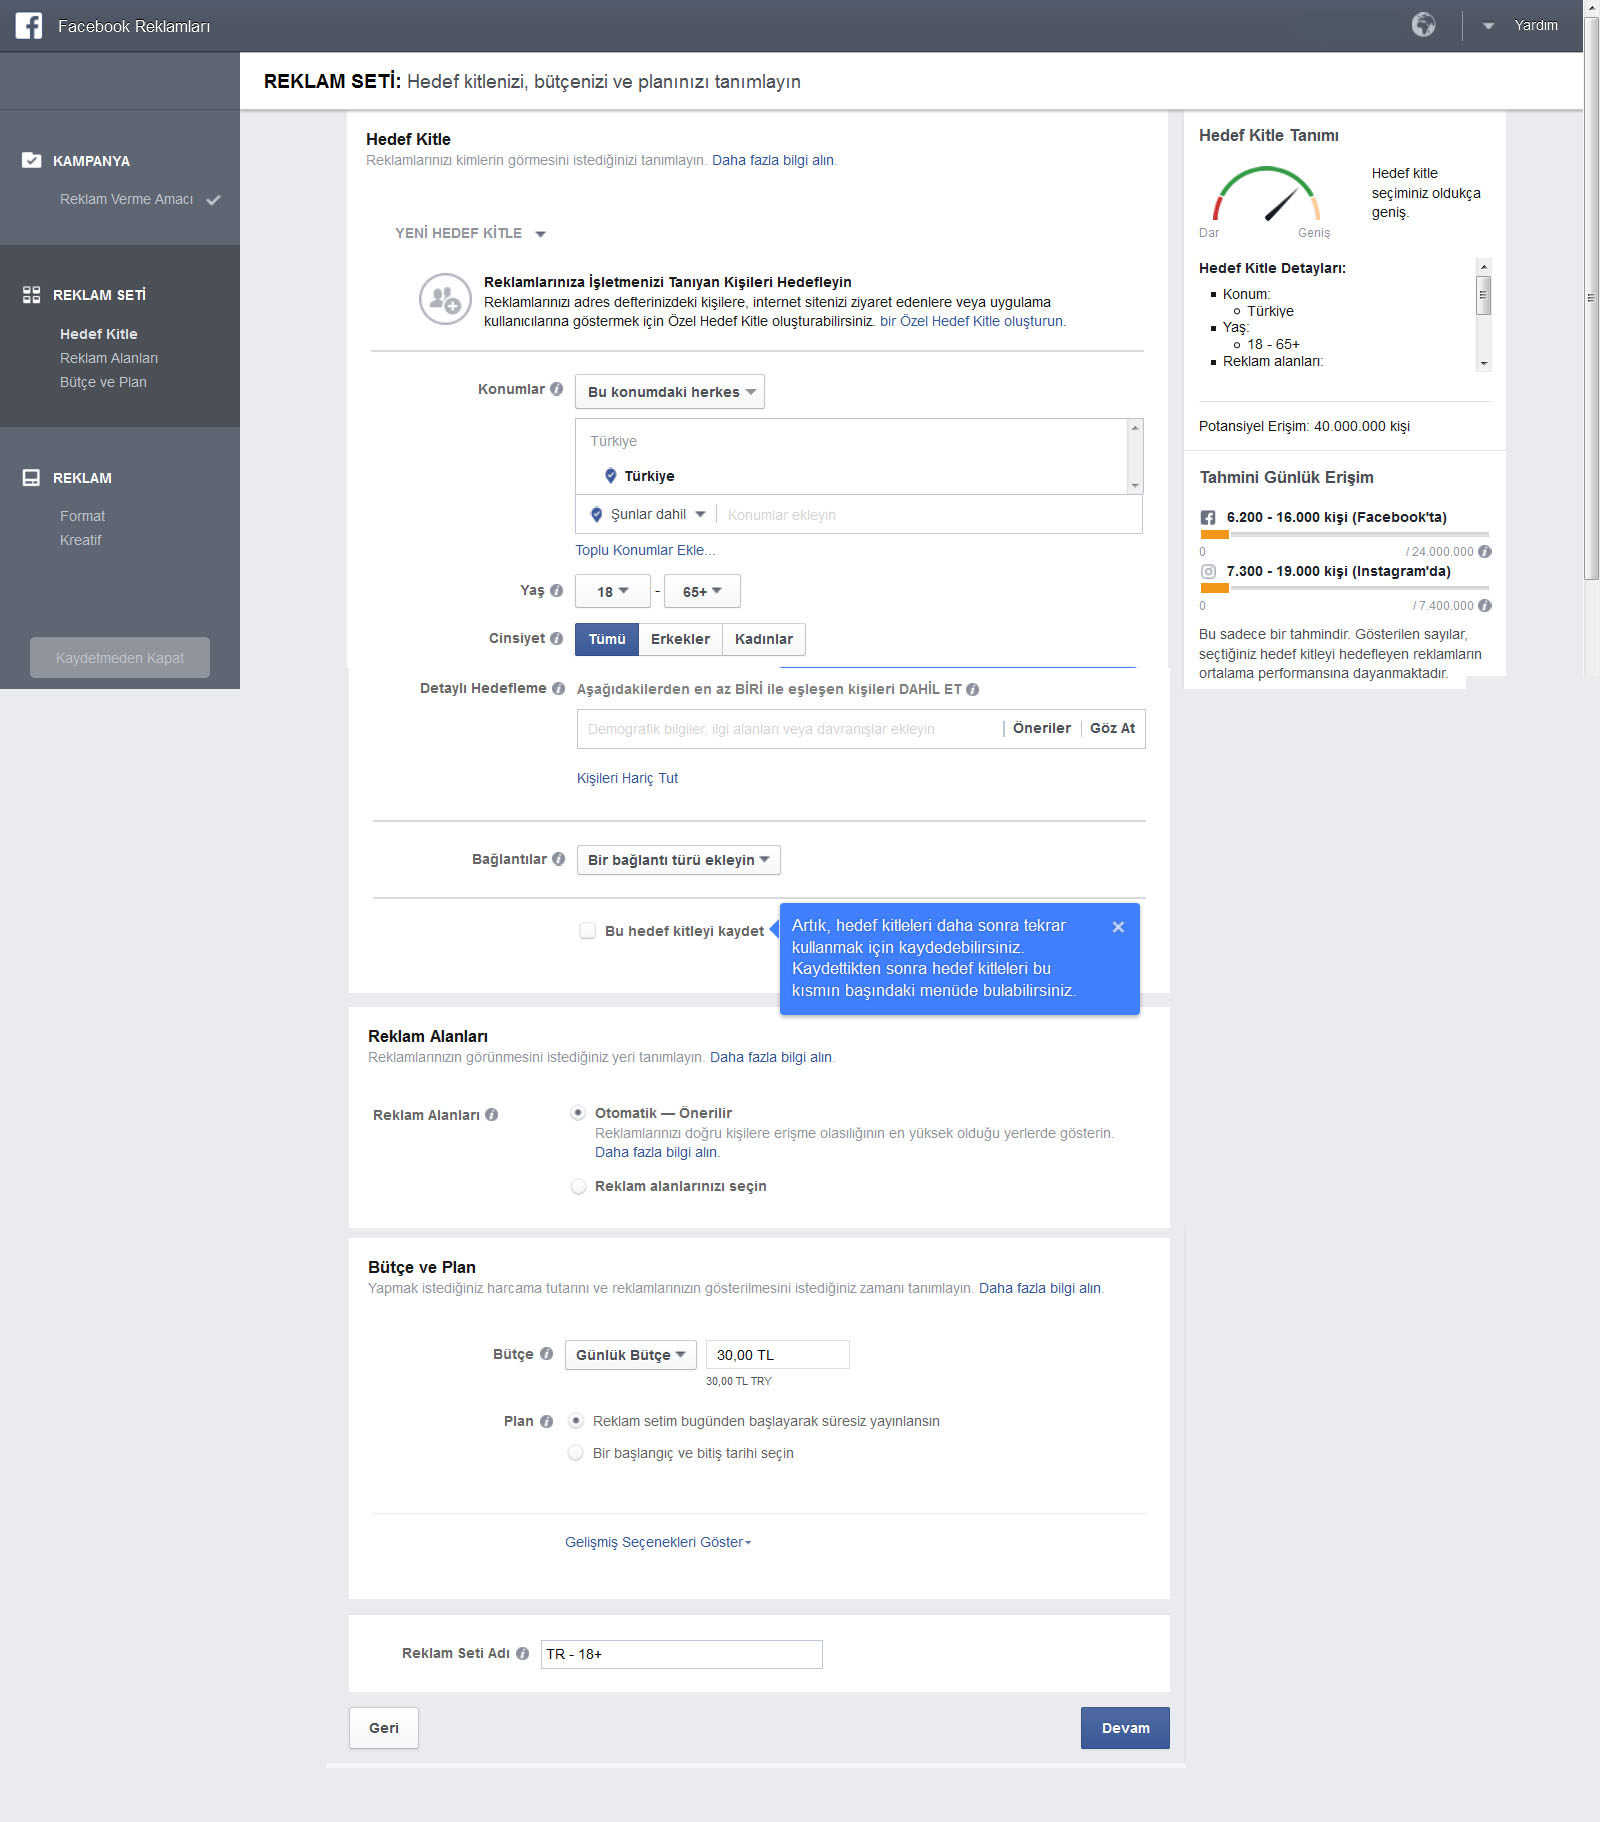 facebook-reklami-4-adim